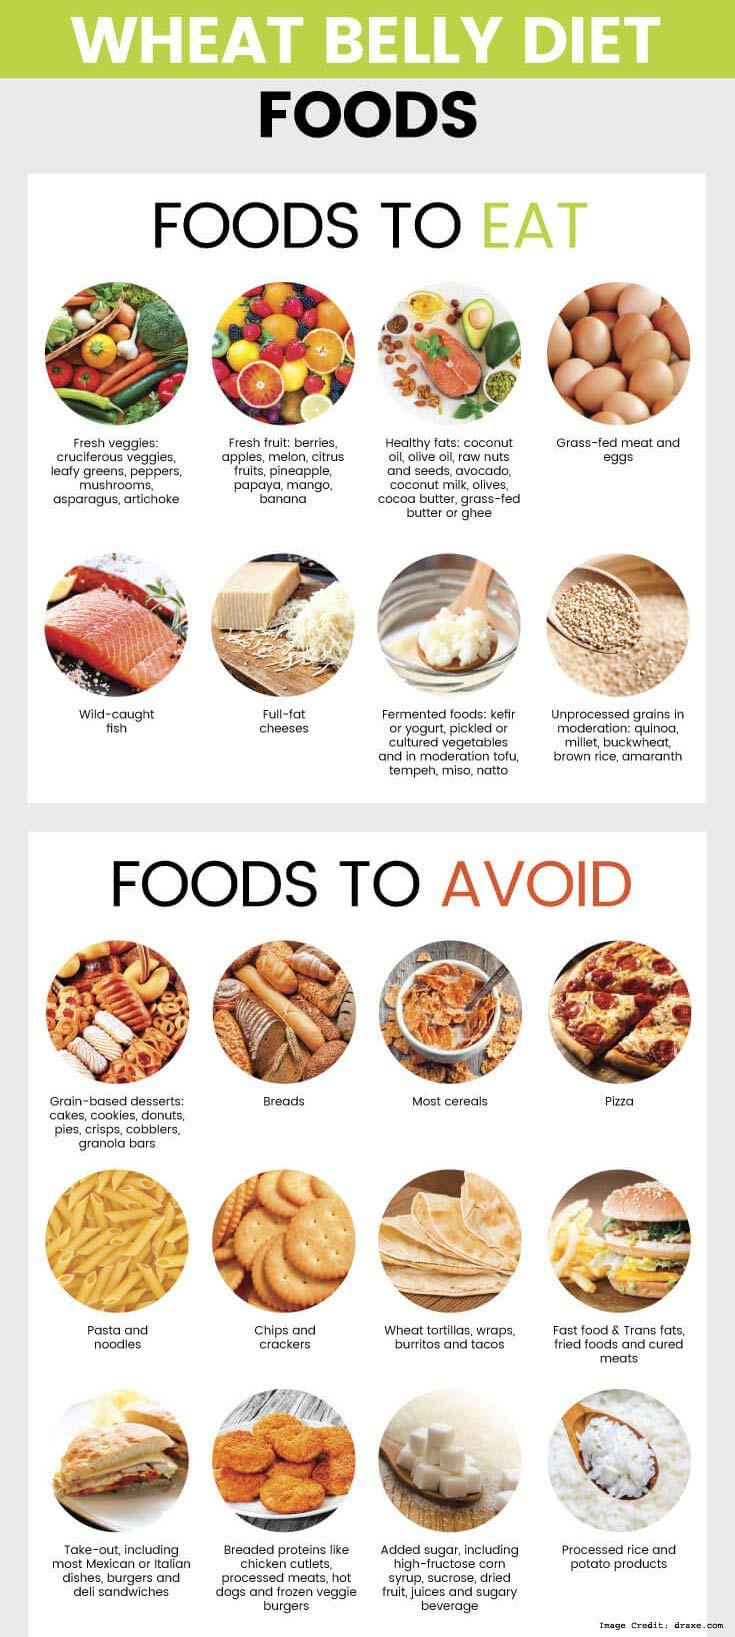 'The Wheat Belly Diet' Program - By Doctor William Davis